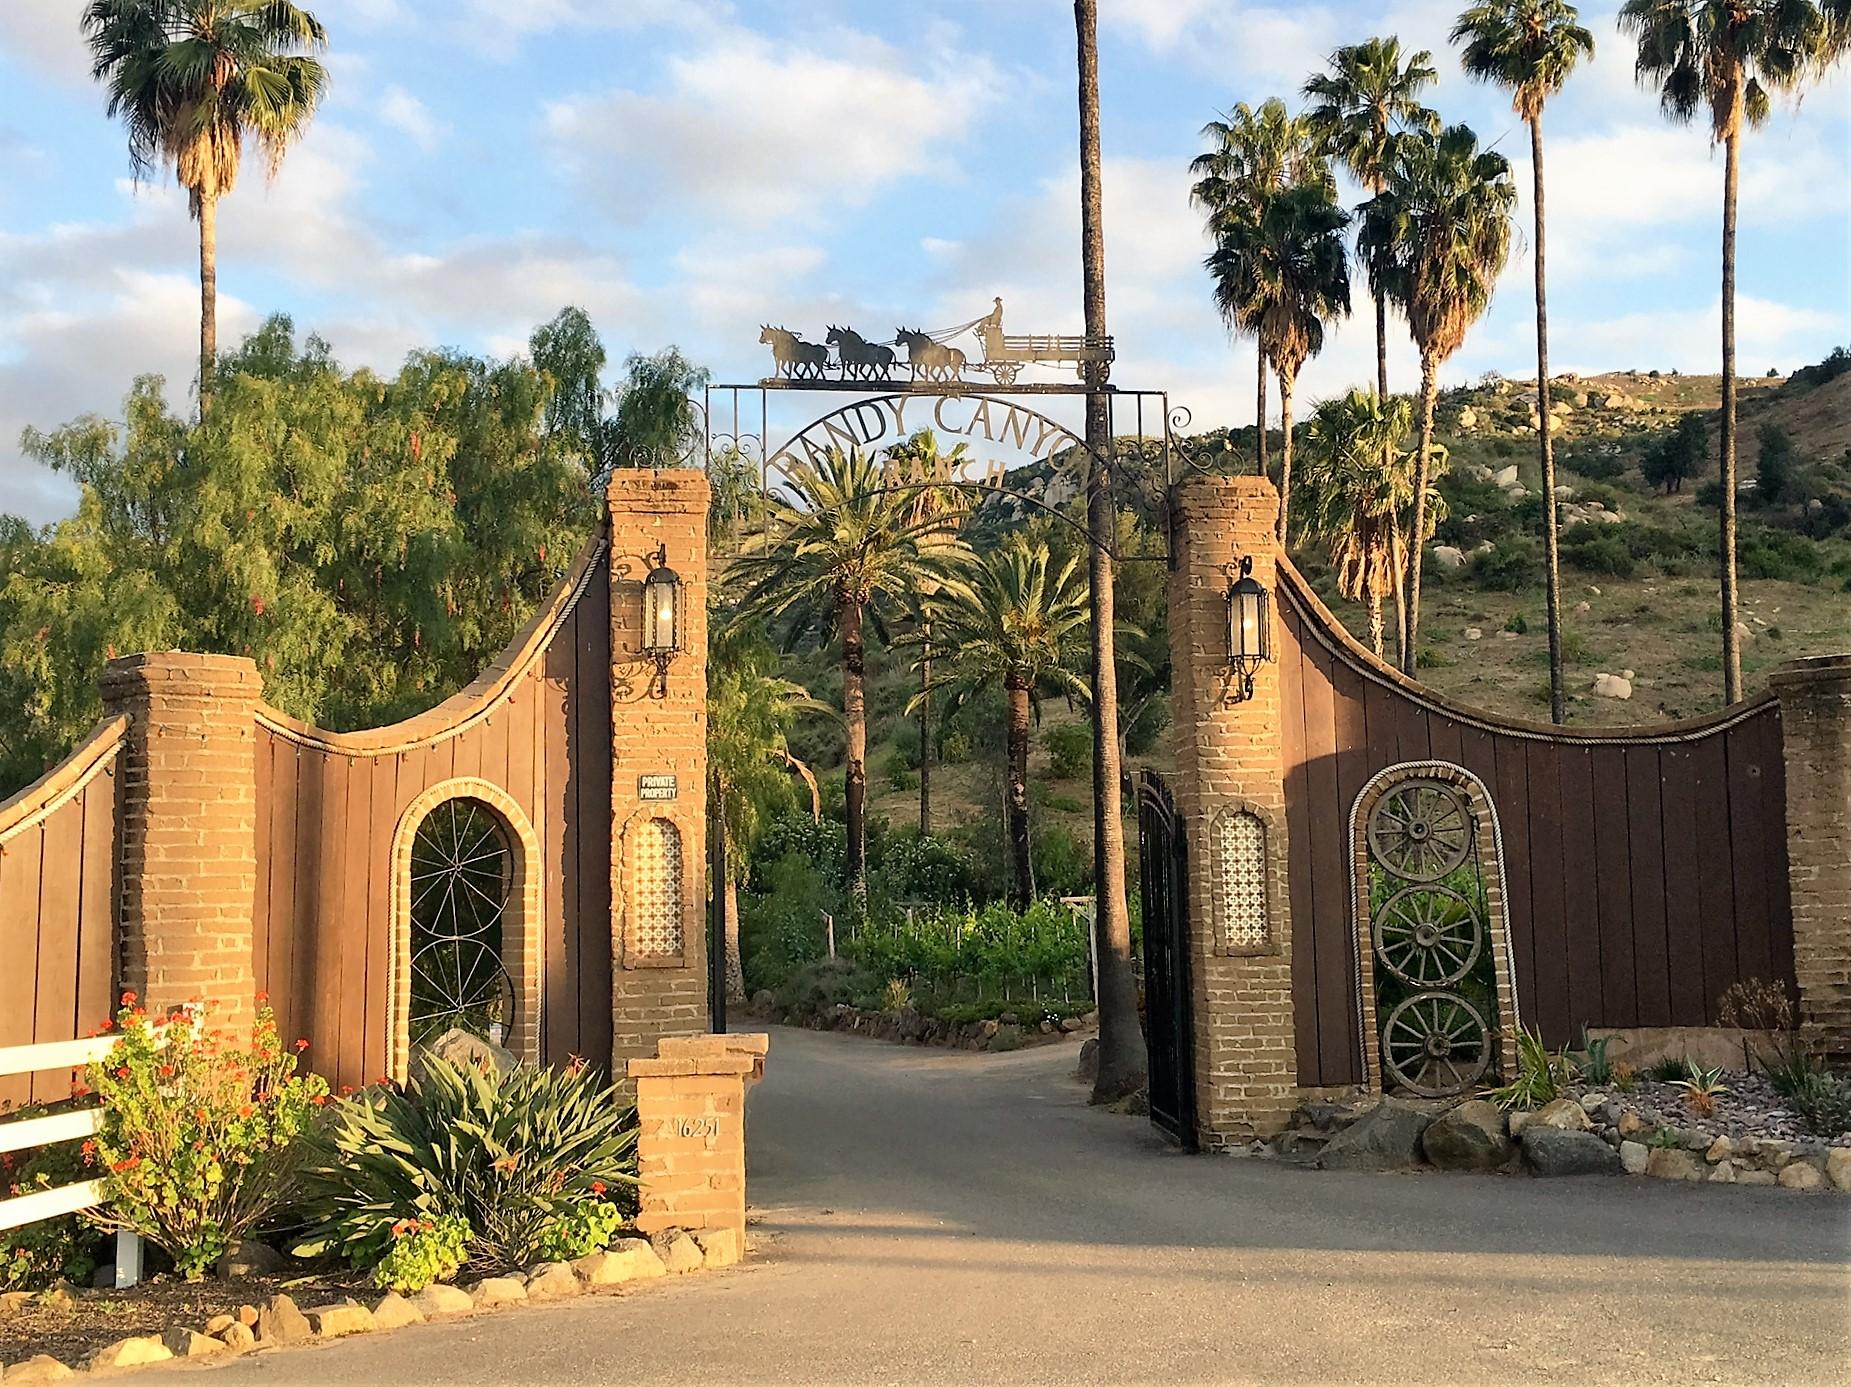 Bandy Canyon Entrance